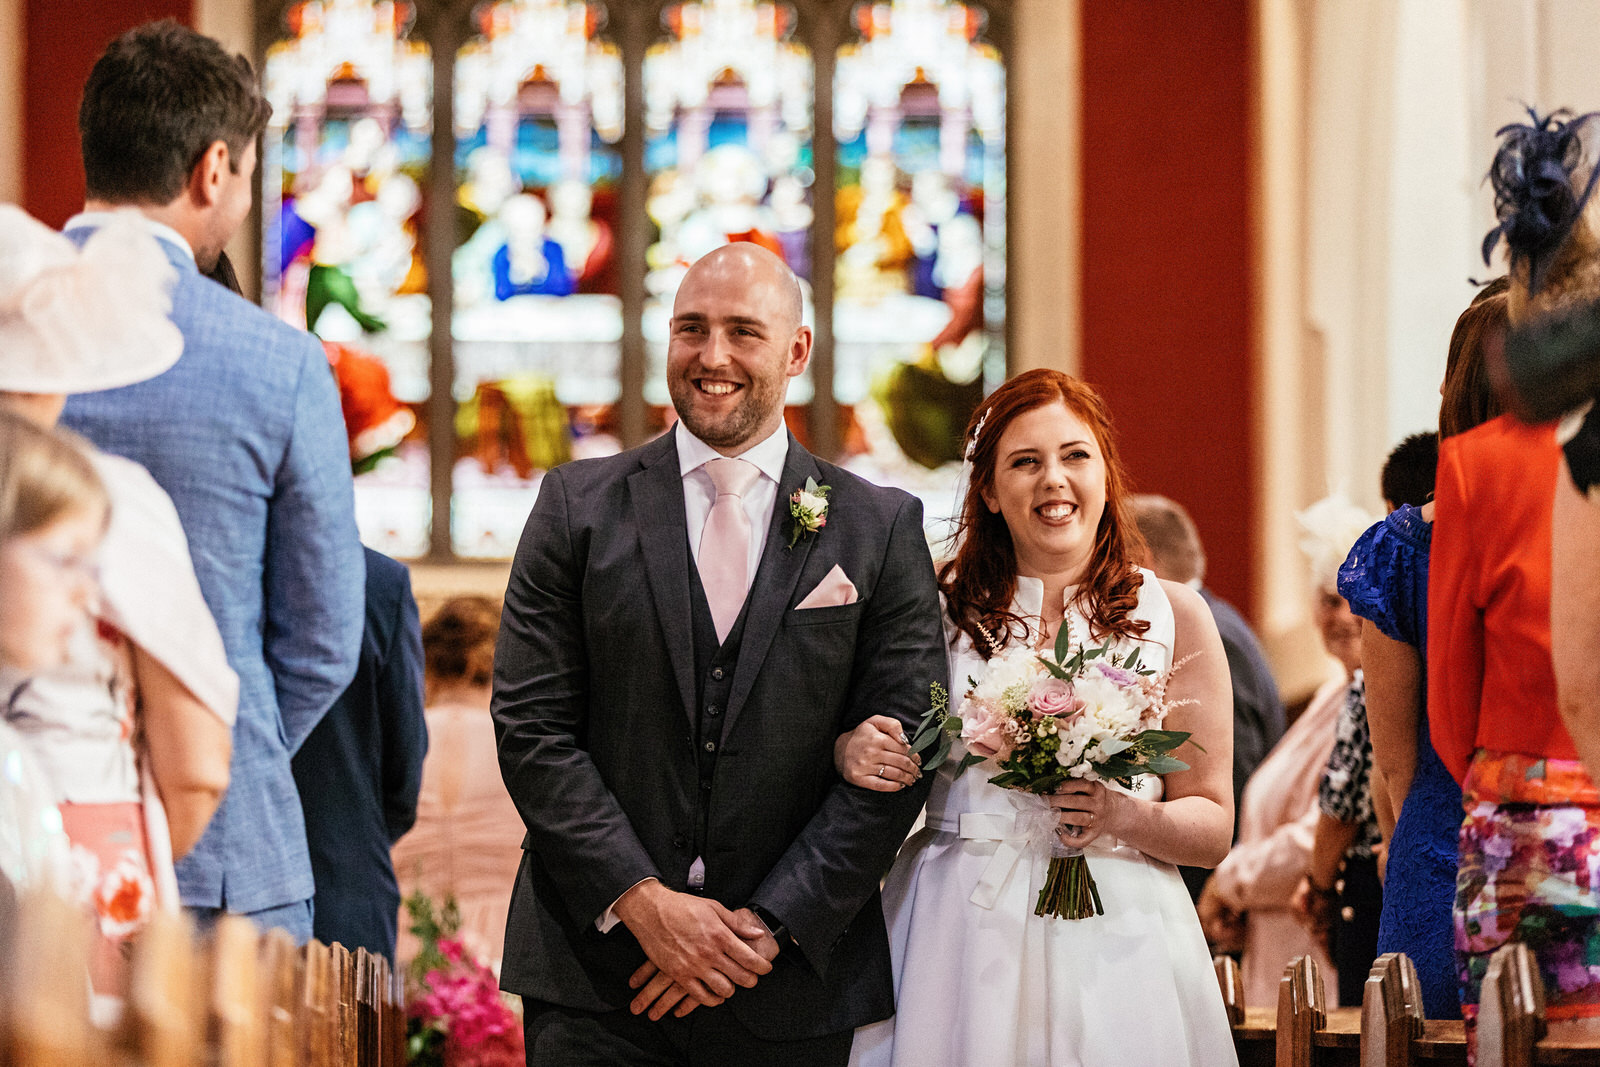 Beamish-Hall-Wedding-Photographer-017.jpg